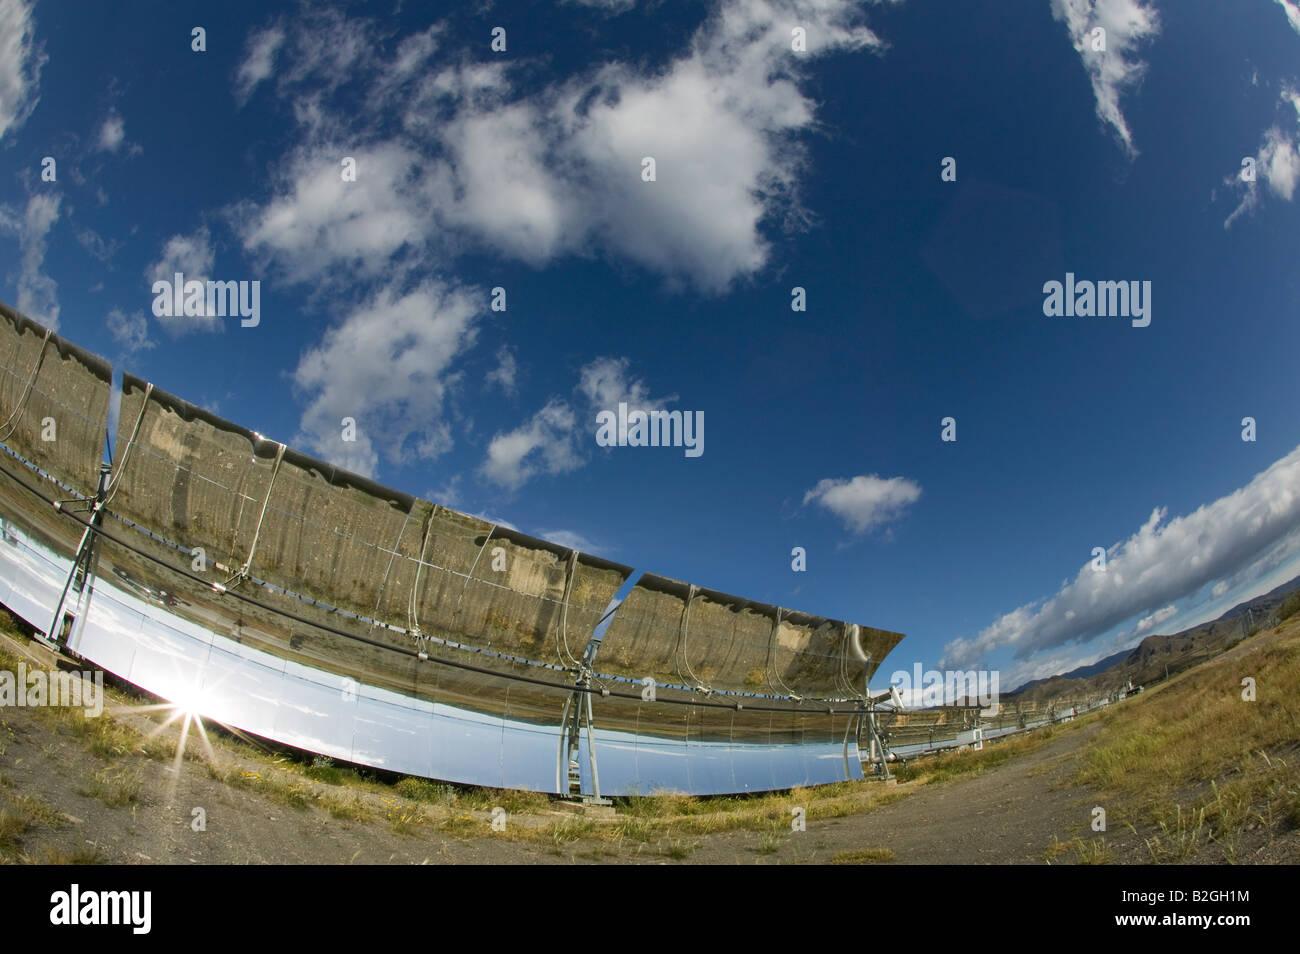 Solar parabolic trough prototype, Ciemat, Plataforma Solar de Almaria, Andalucia, Spain - Stock Image